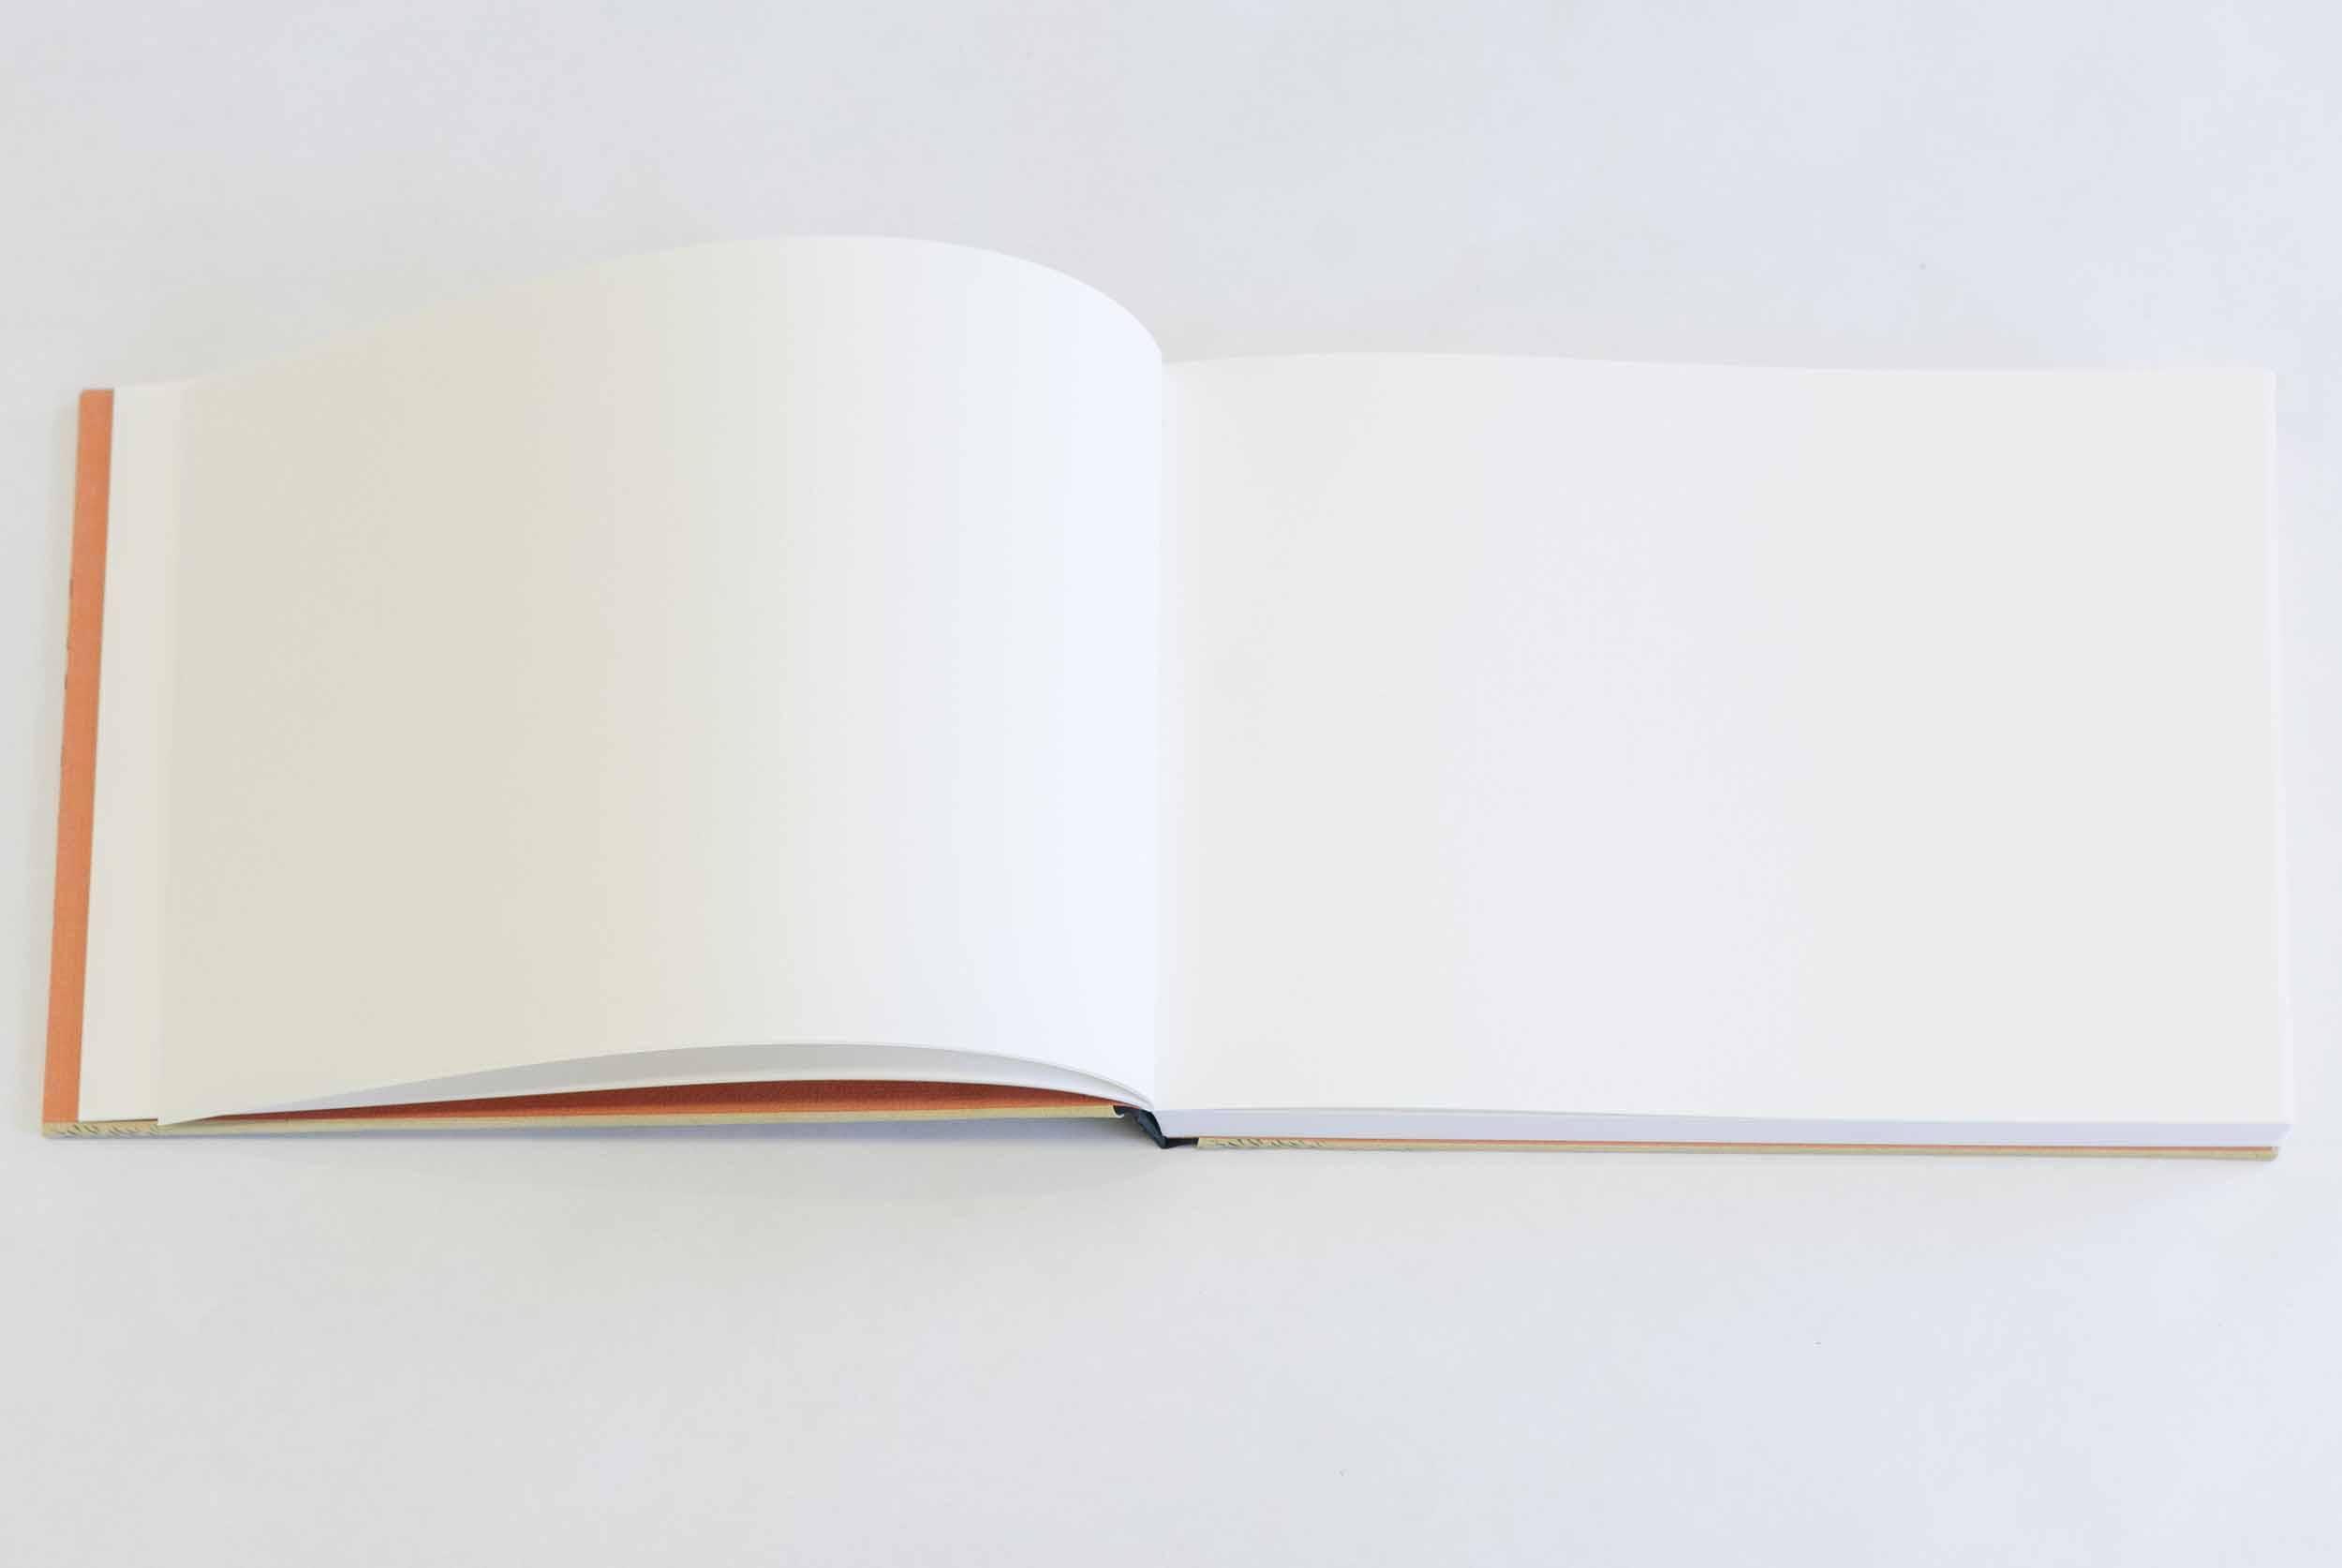 Sketchbook format, design 2 (Girl by the brook), interior pages